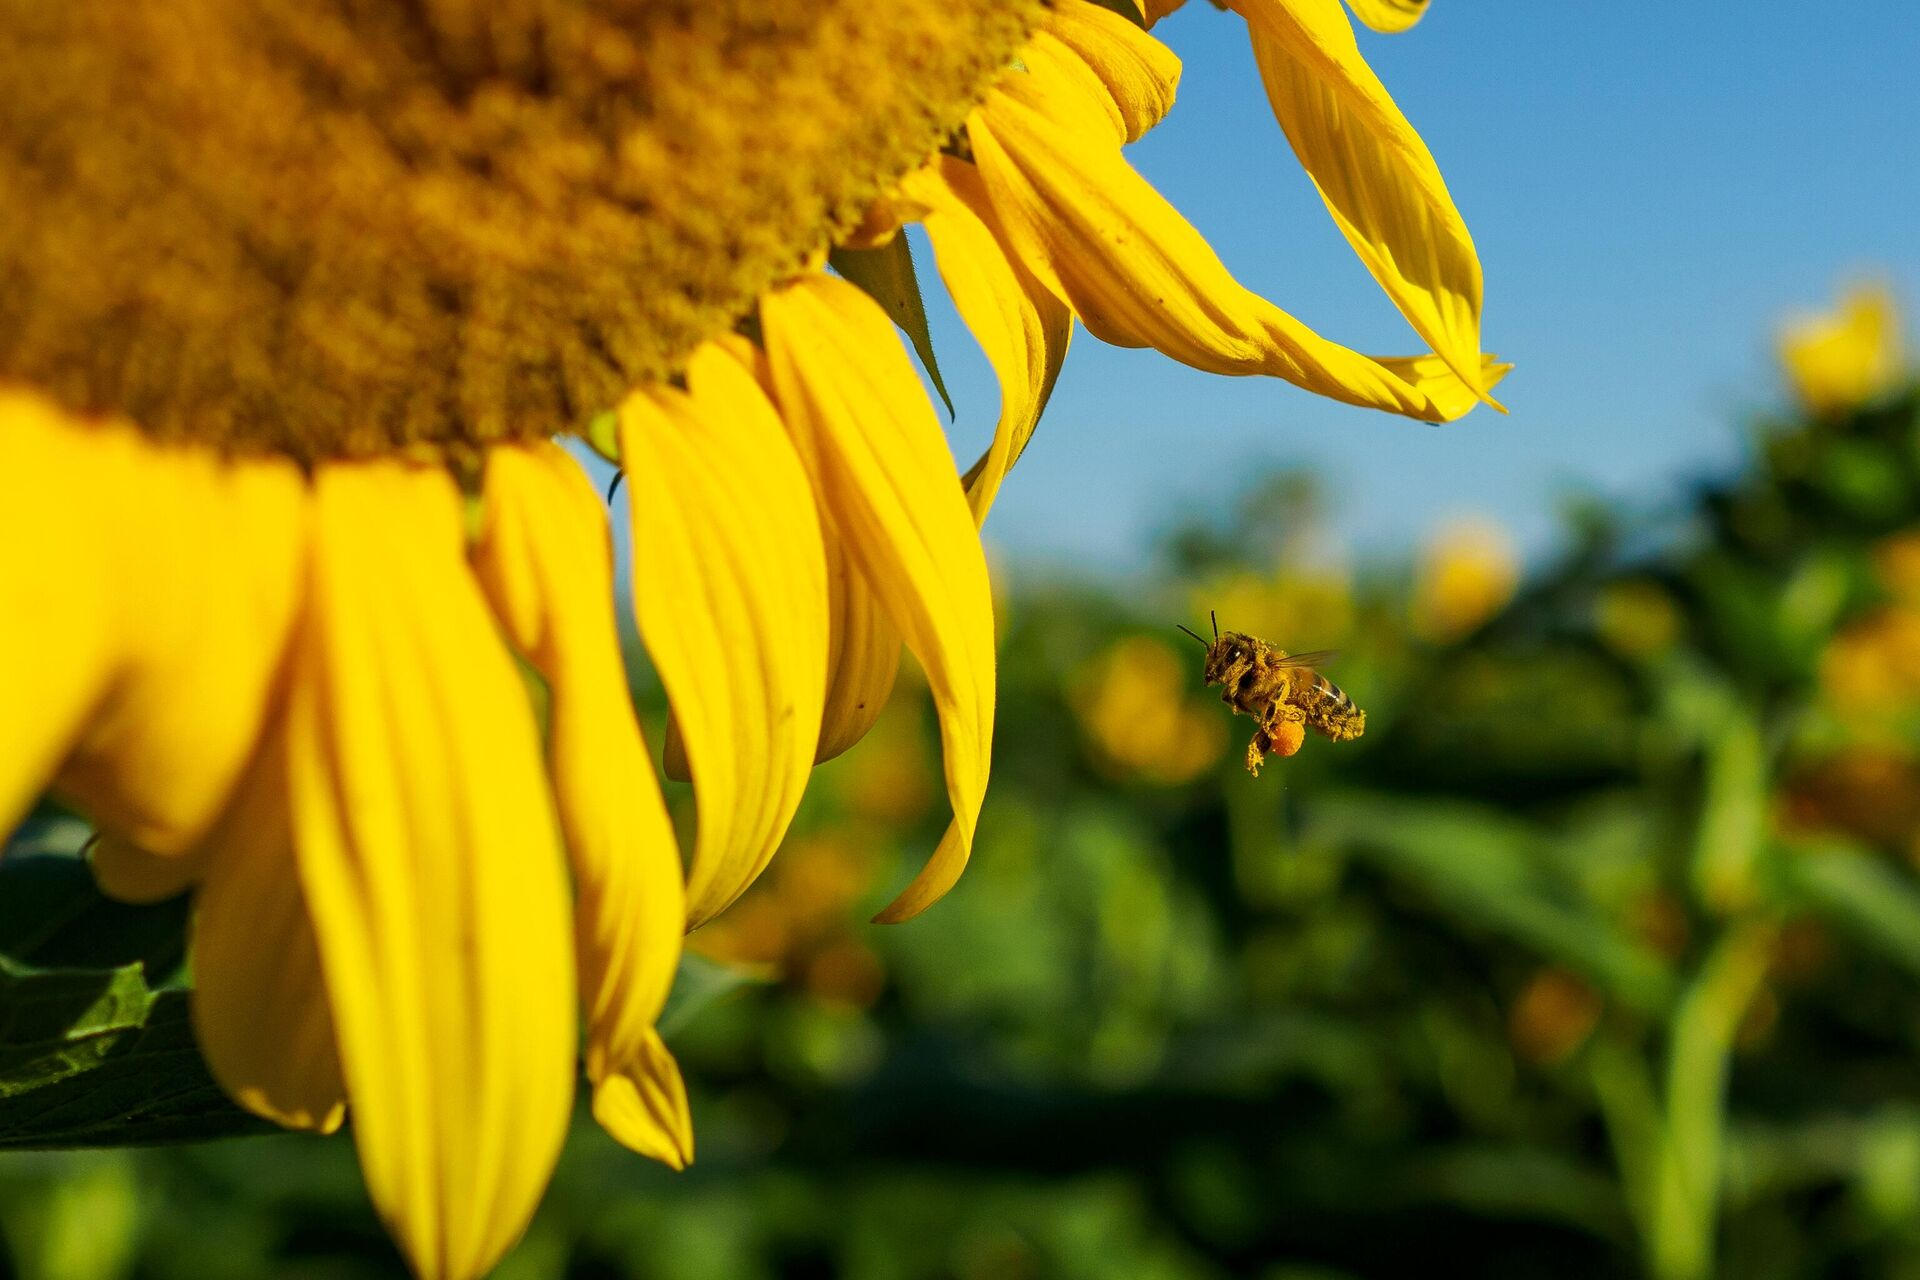 Пчела около цветка подсолнечника - РИА Новости, 1920, 28.09.2020